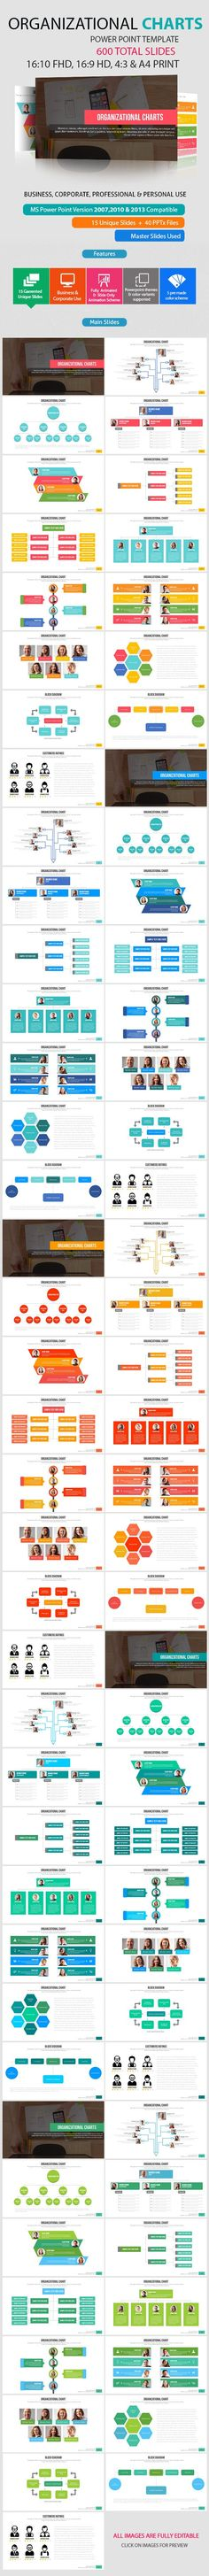 15 Best Org Chart Ideas Images Organizational Chart Info Graphics